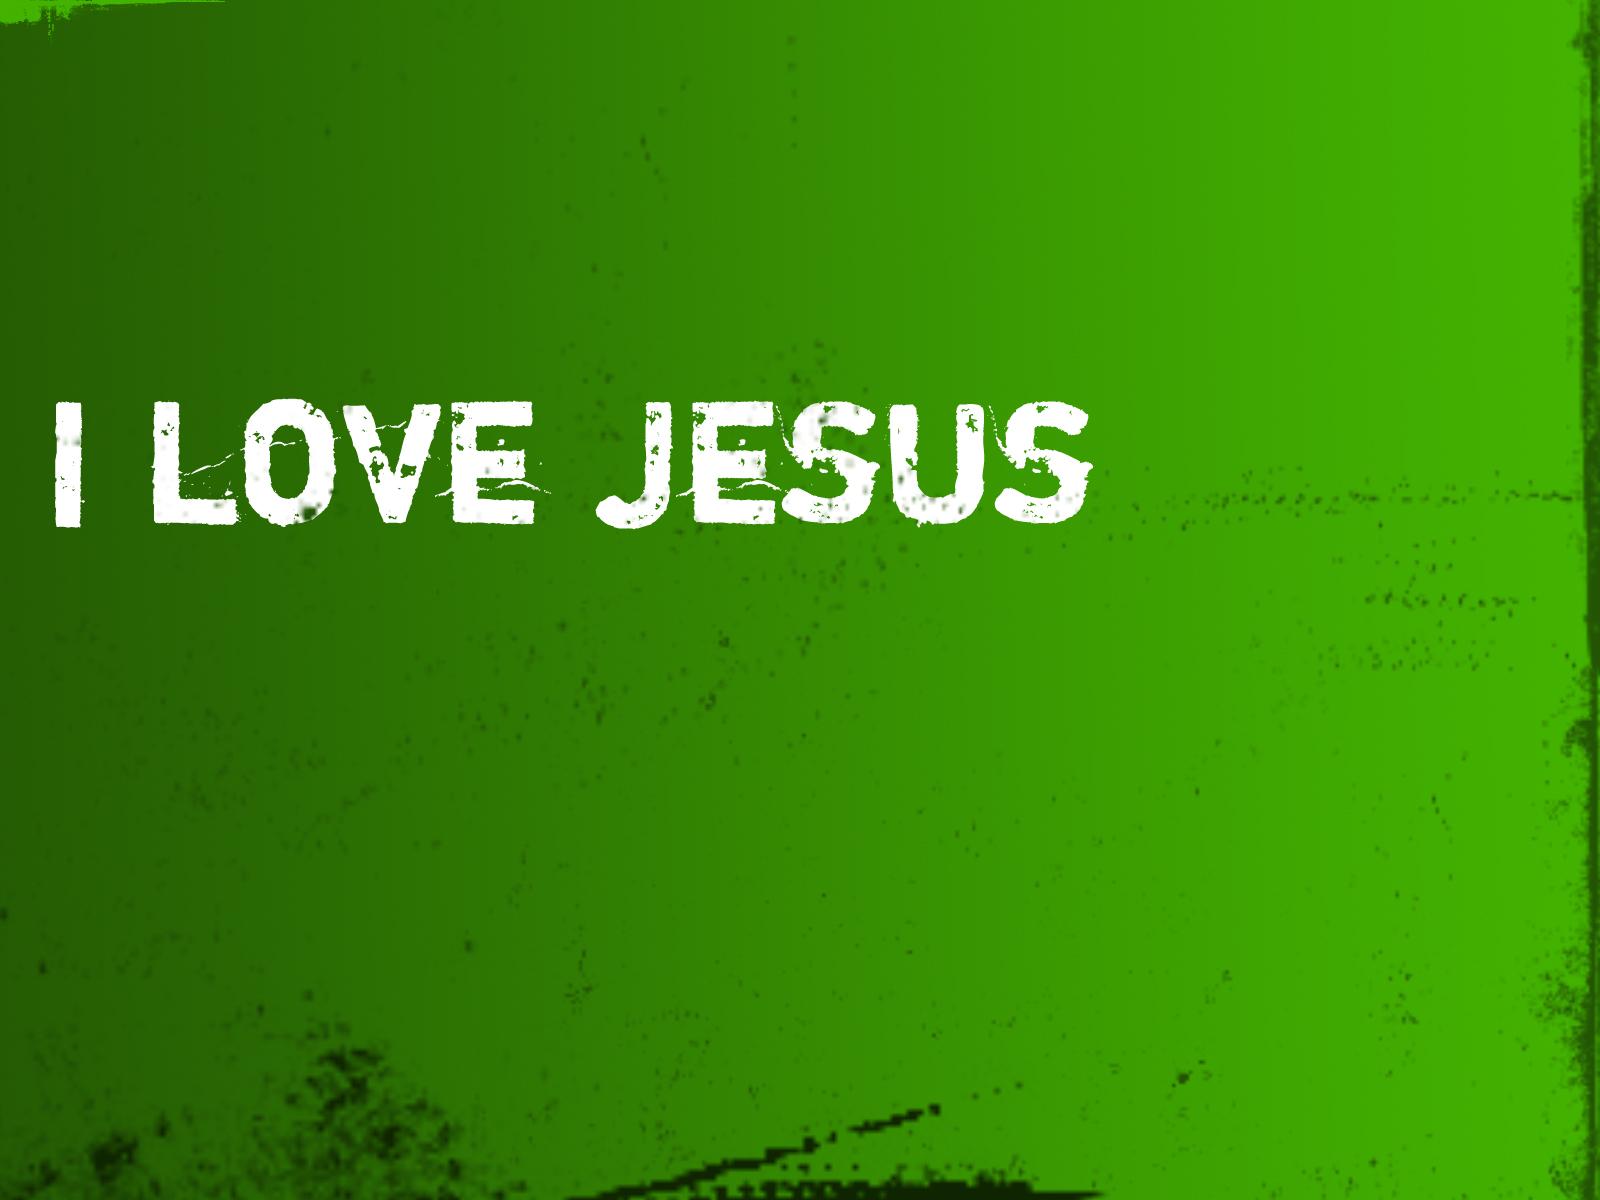 Wallpapers Jesus Christ Desktop Backgrounds for Christians 1600x1200